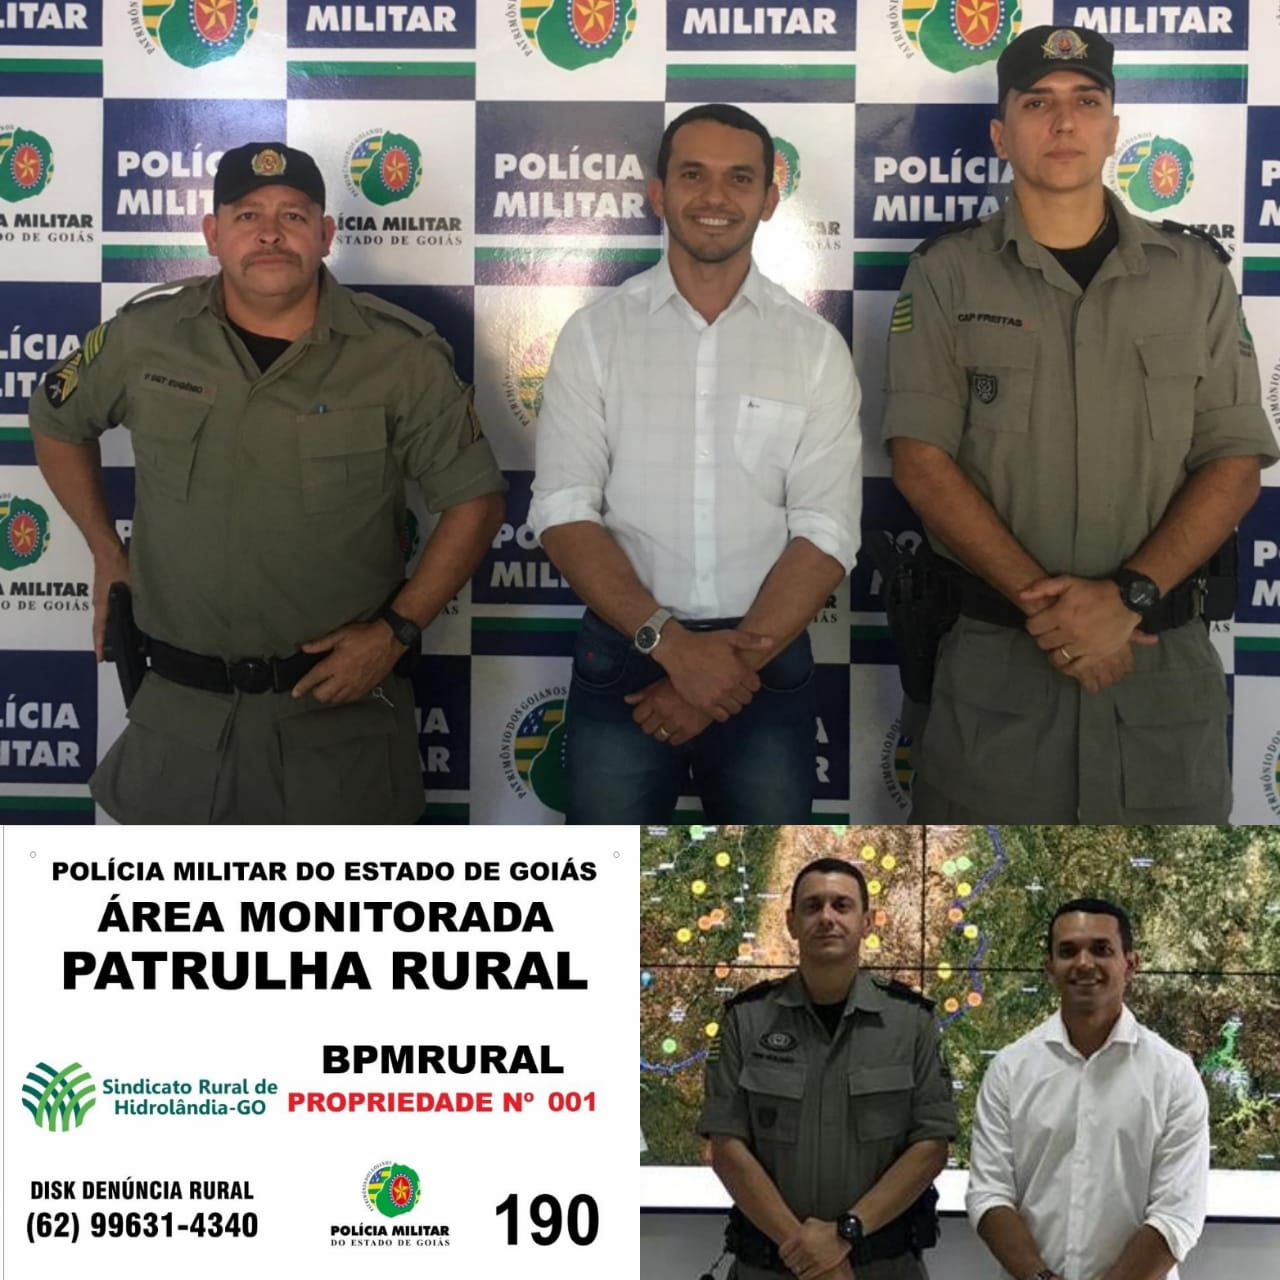 Pol�cia Militar come�a implantar a Patrulha Rural Georreferenciada no Munic�pio de Hidrol�ndia